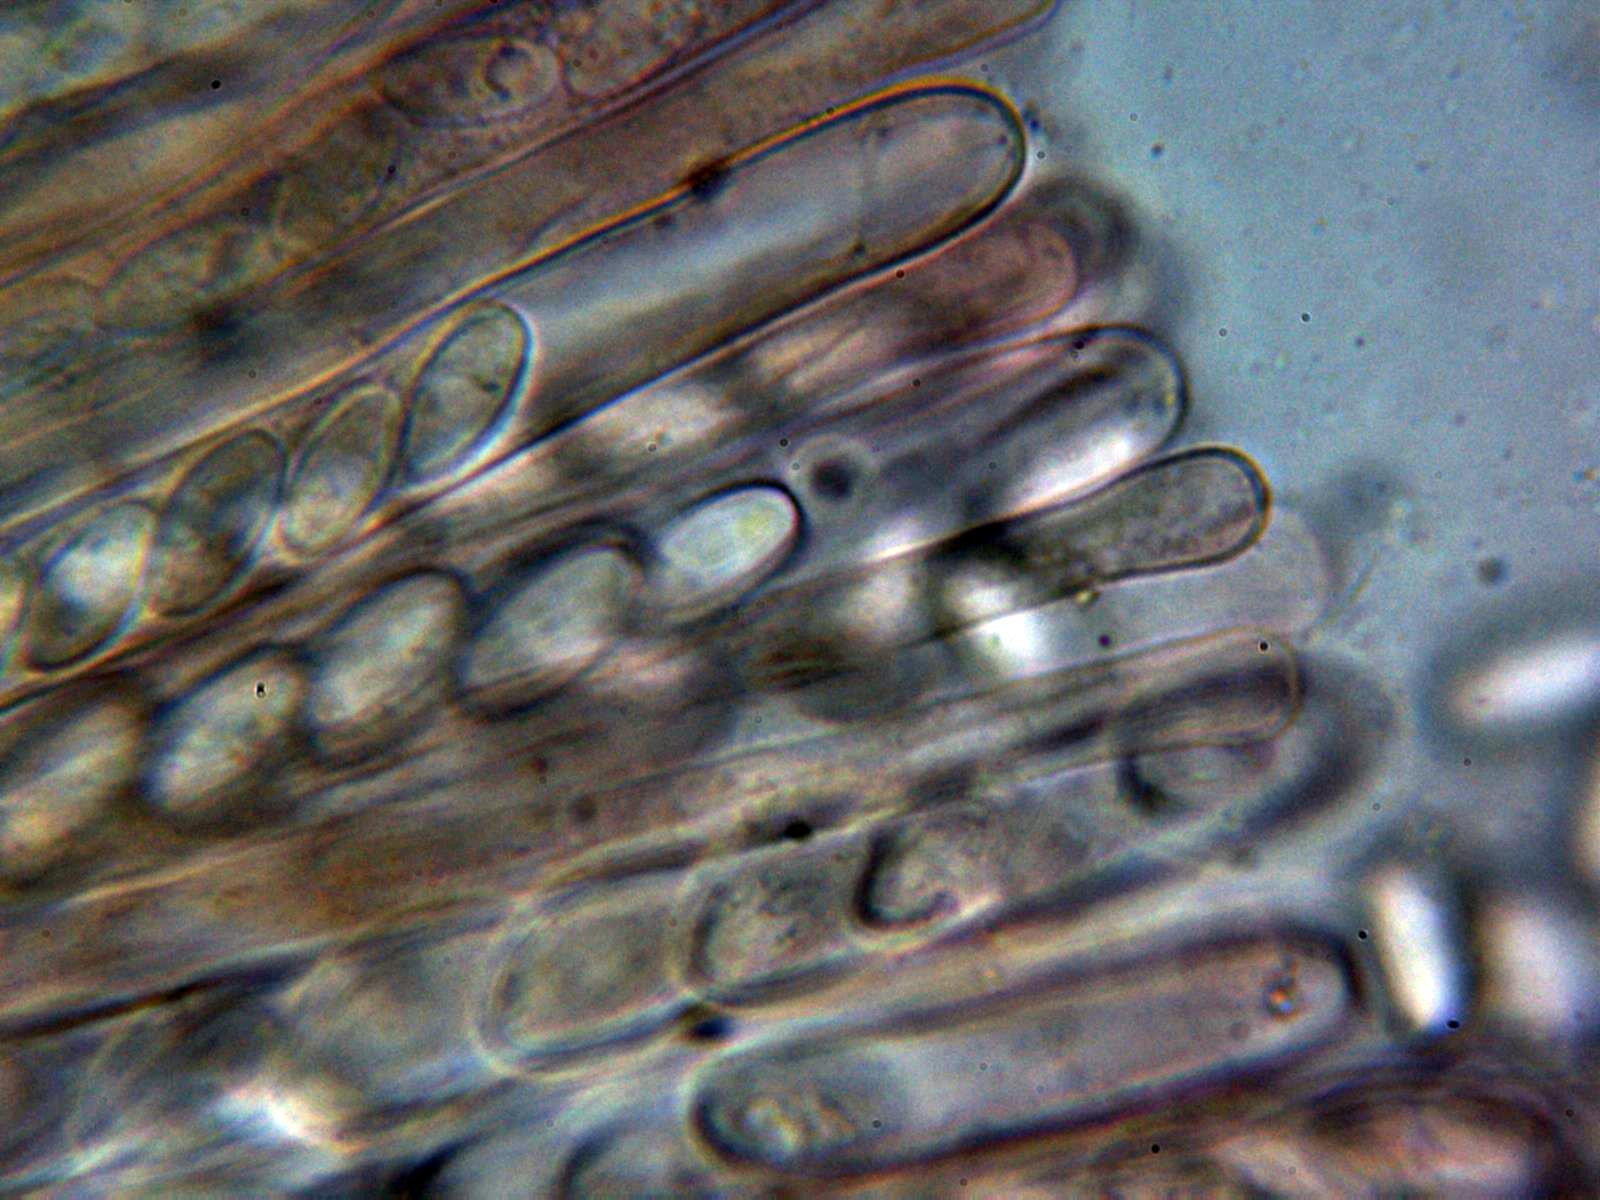 Ascosyparfisis1_2021-06-30.jpg